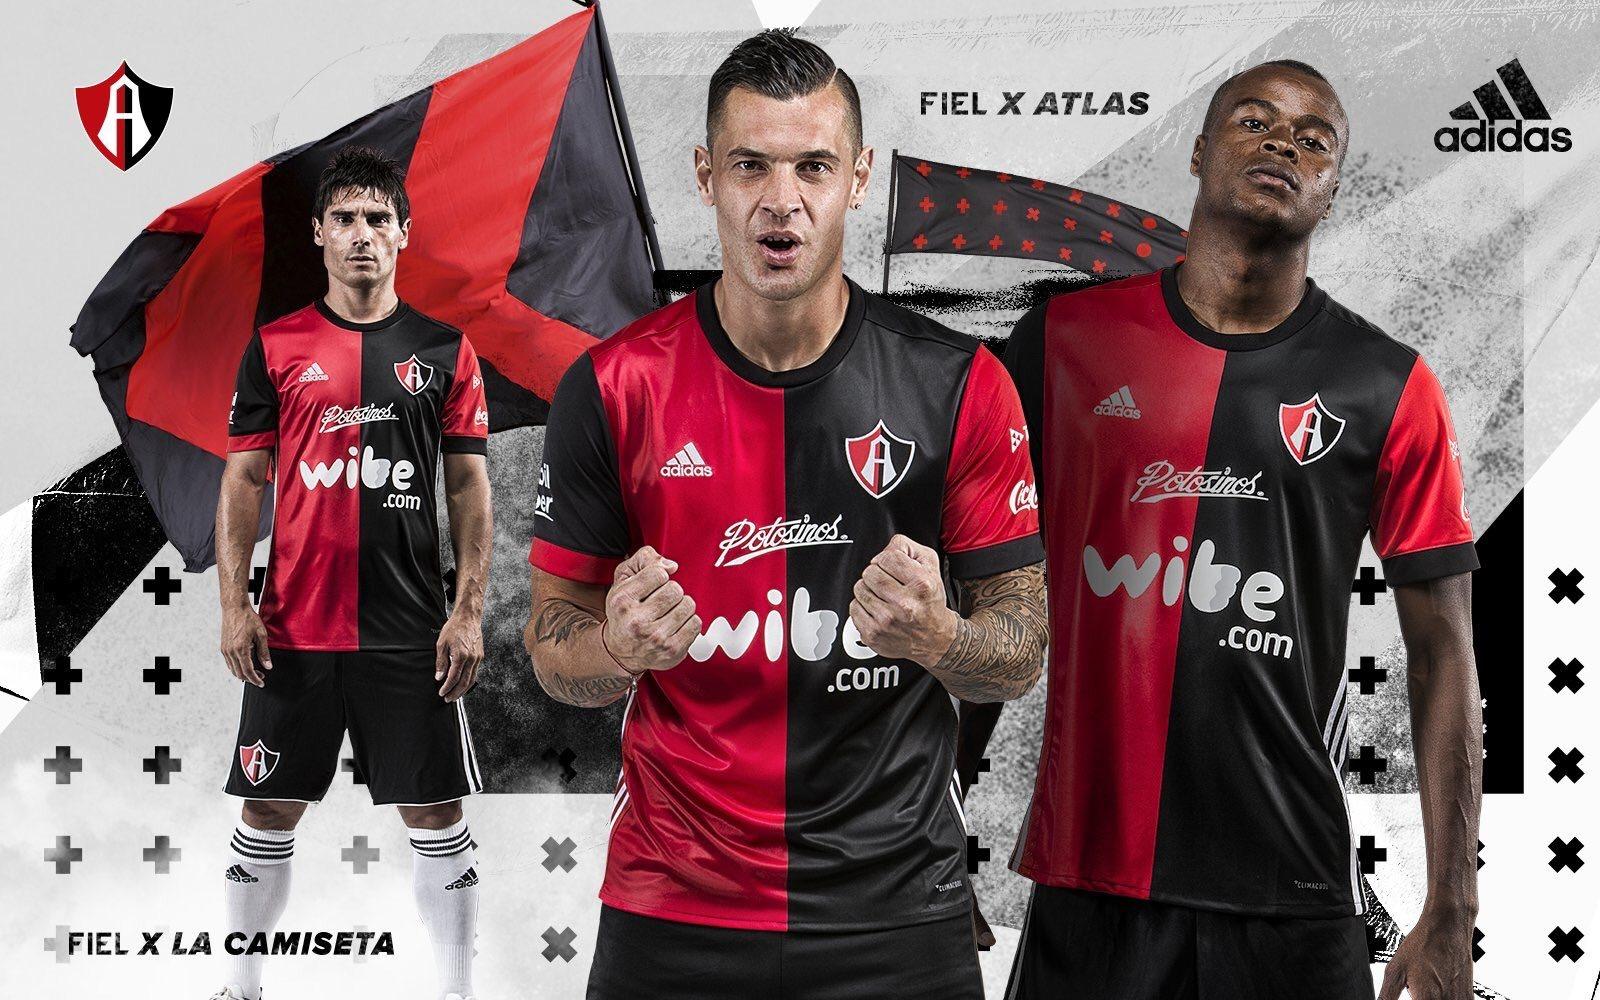 Nueva camiseta titular Adidas del Atlas | Foto Twitter Oficial